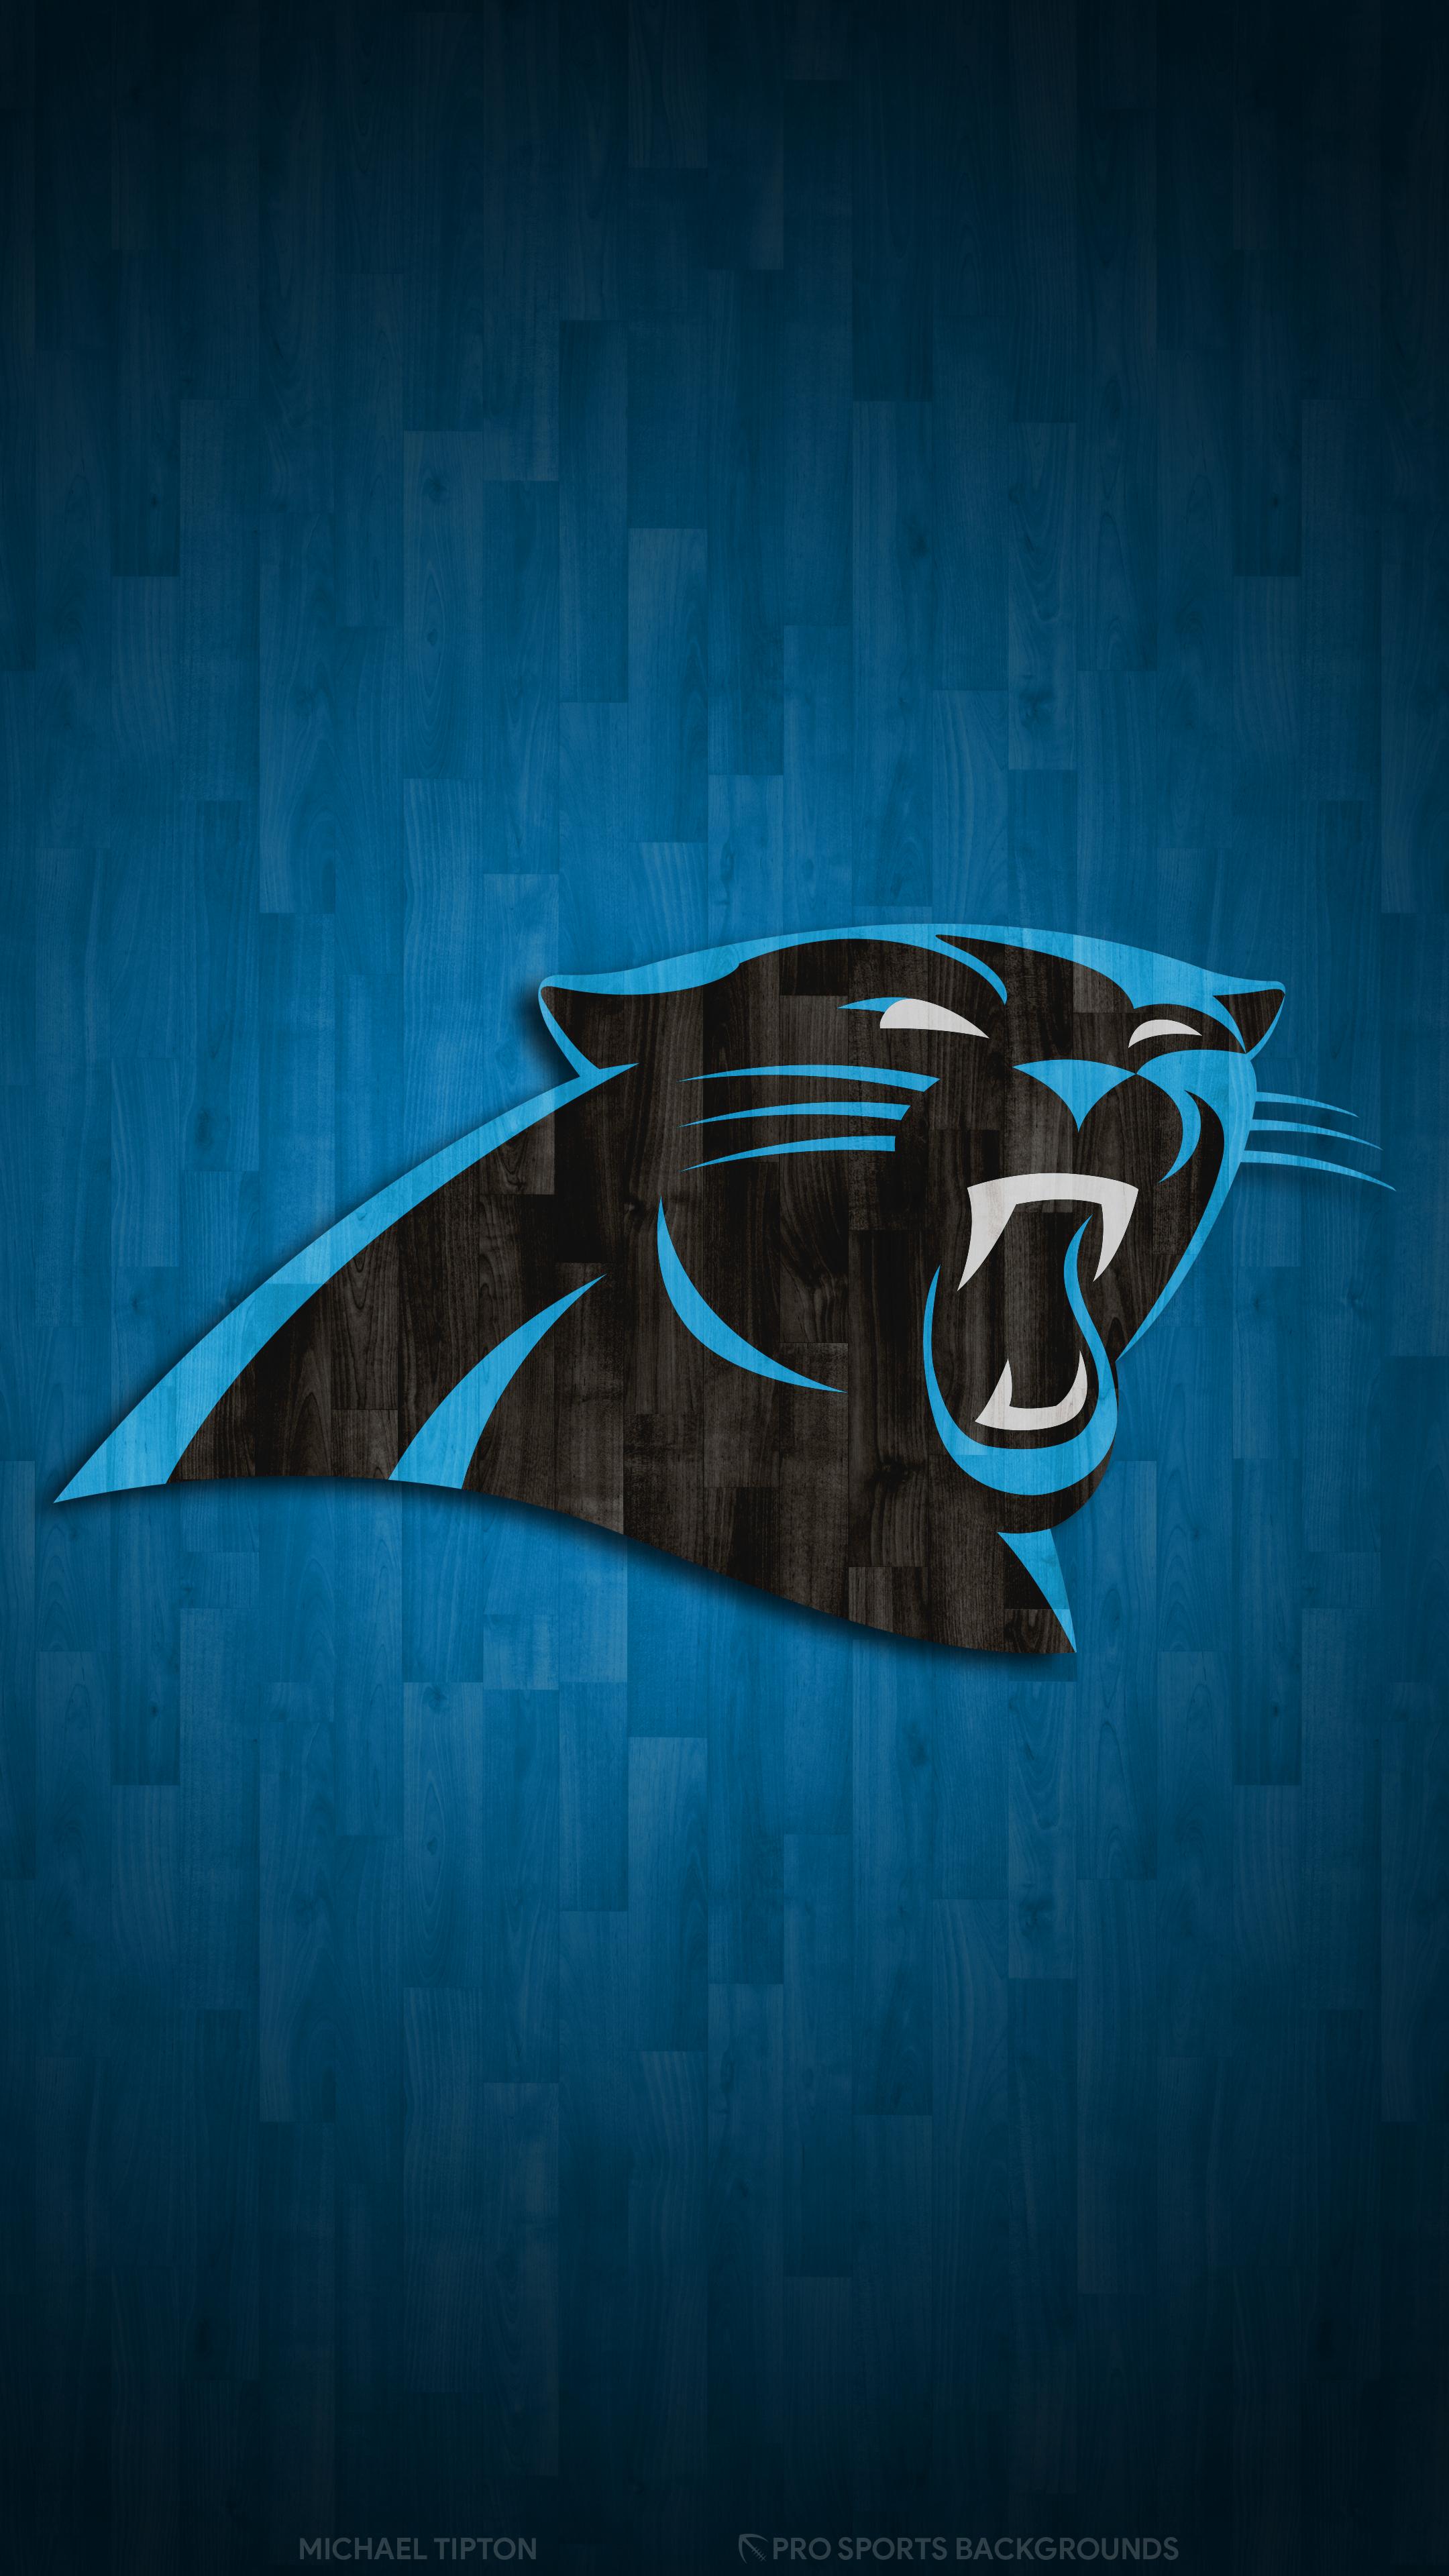 Pin By Coolmanm41 On Room Ideas In 2020 Carolina Panthers Wallpaper Carolina Panthers Panthers